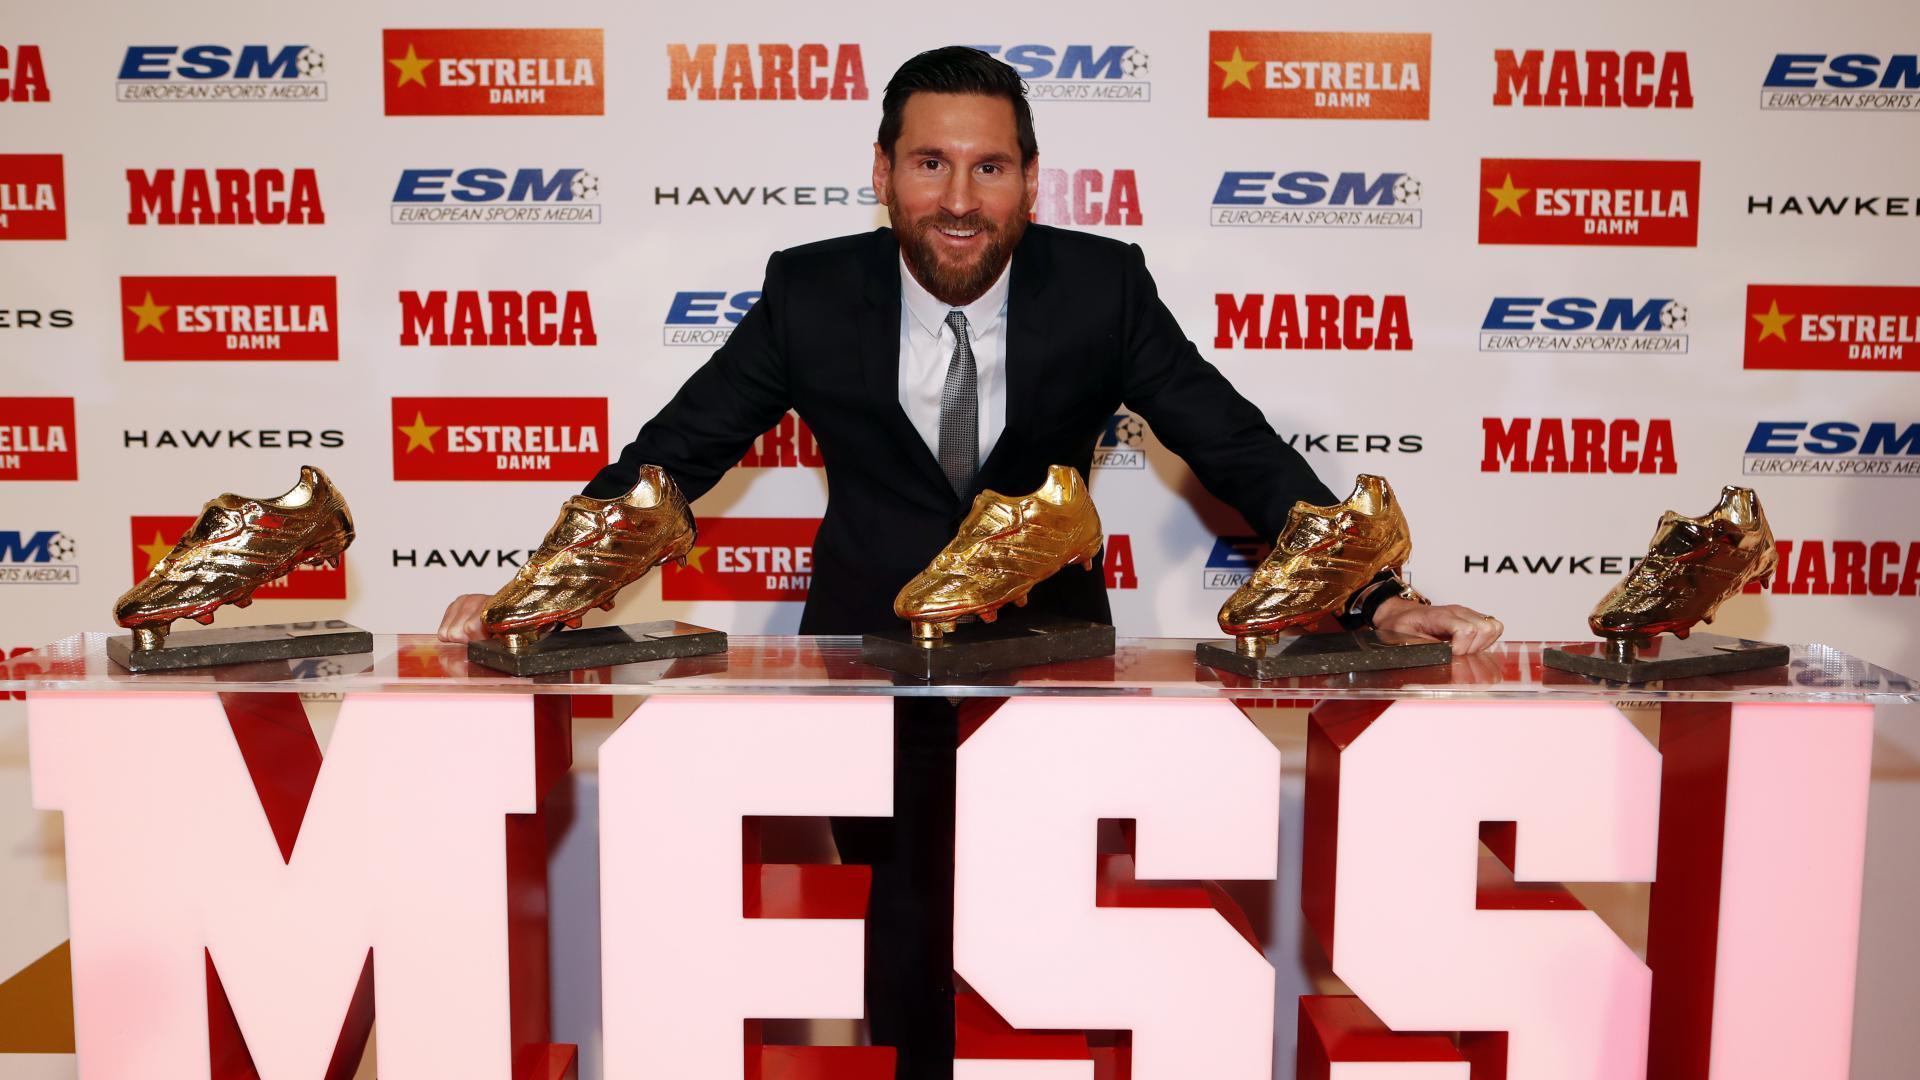 Leo Messi receives his fifth Golden Shoe